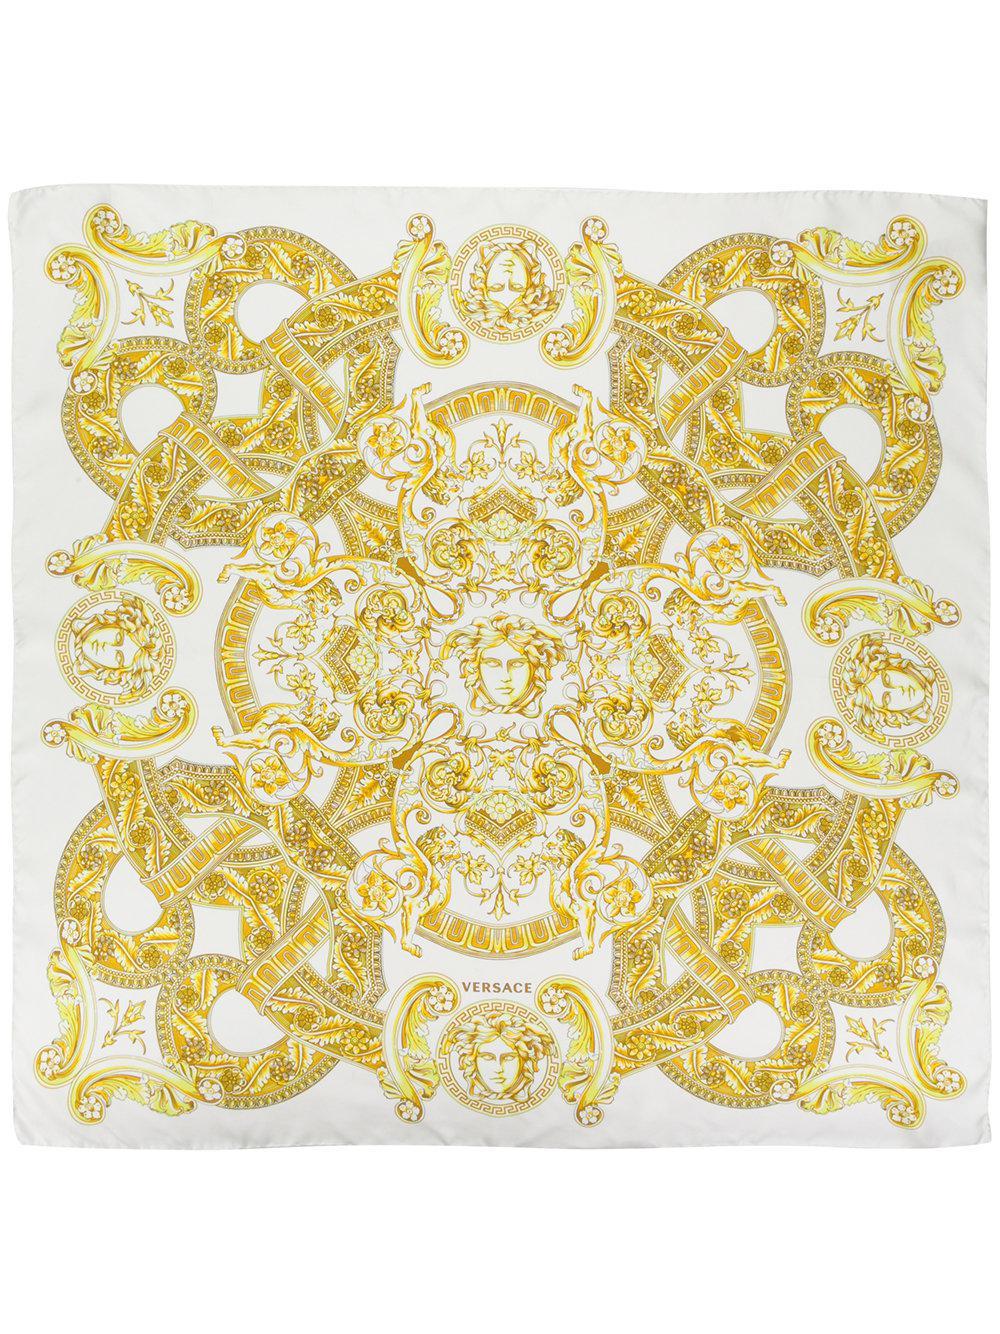 367b74bf4b Versace - White Baroque Print Scarf - Lyst. View fullscreen